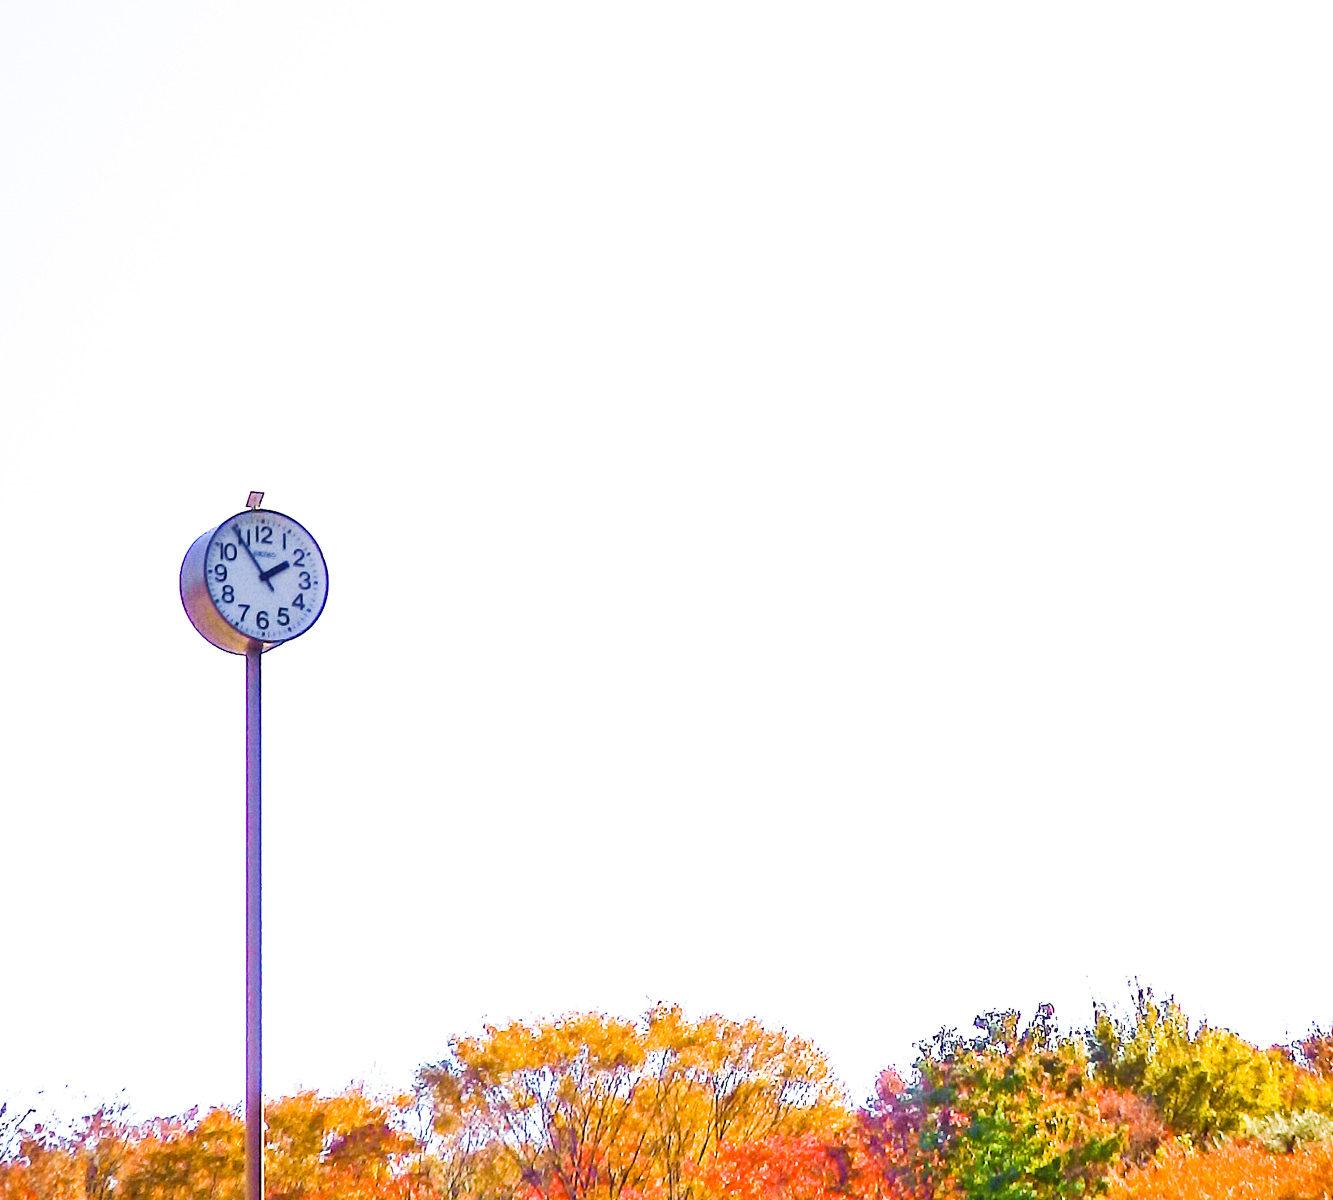 紅葉(コウヨウ)